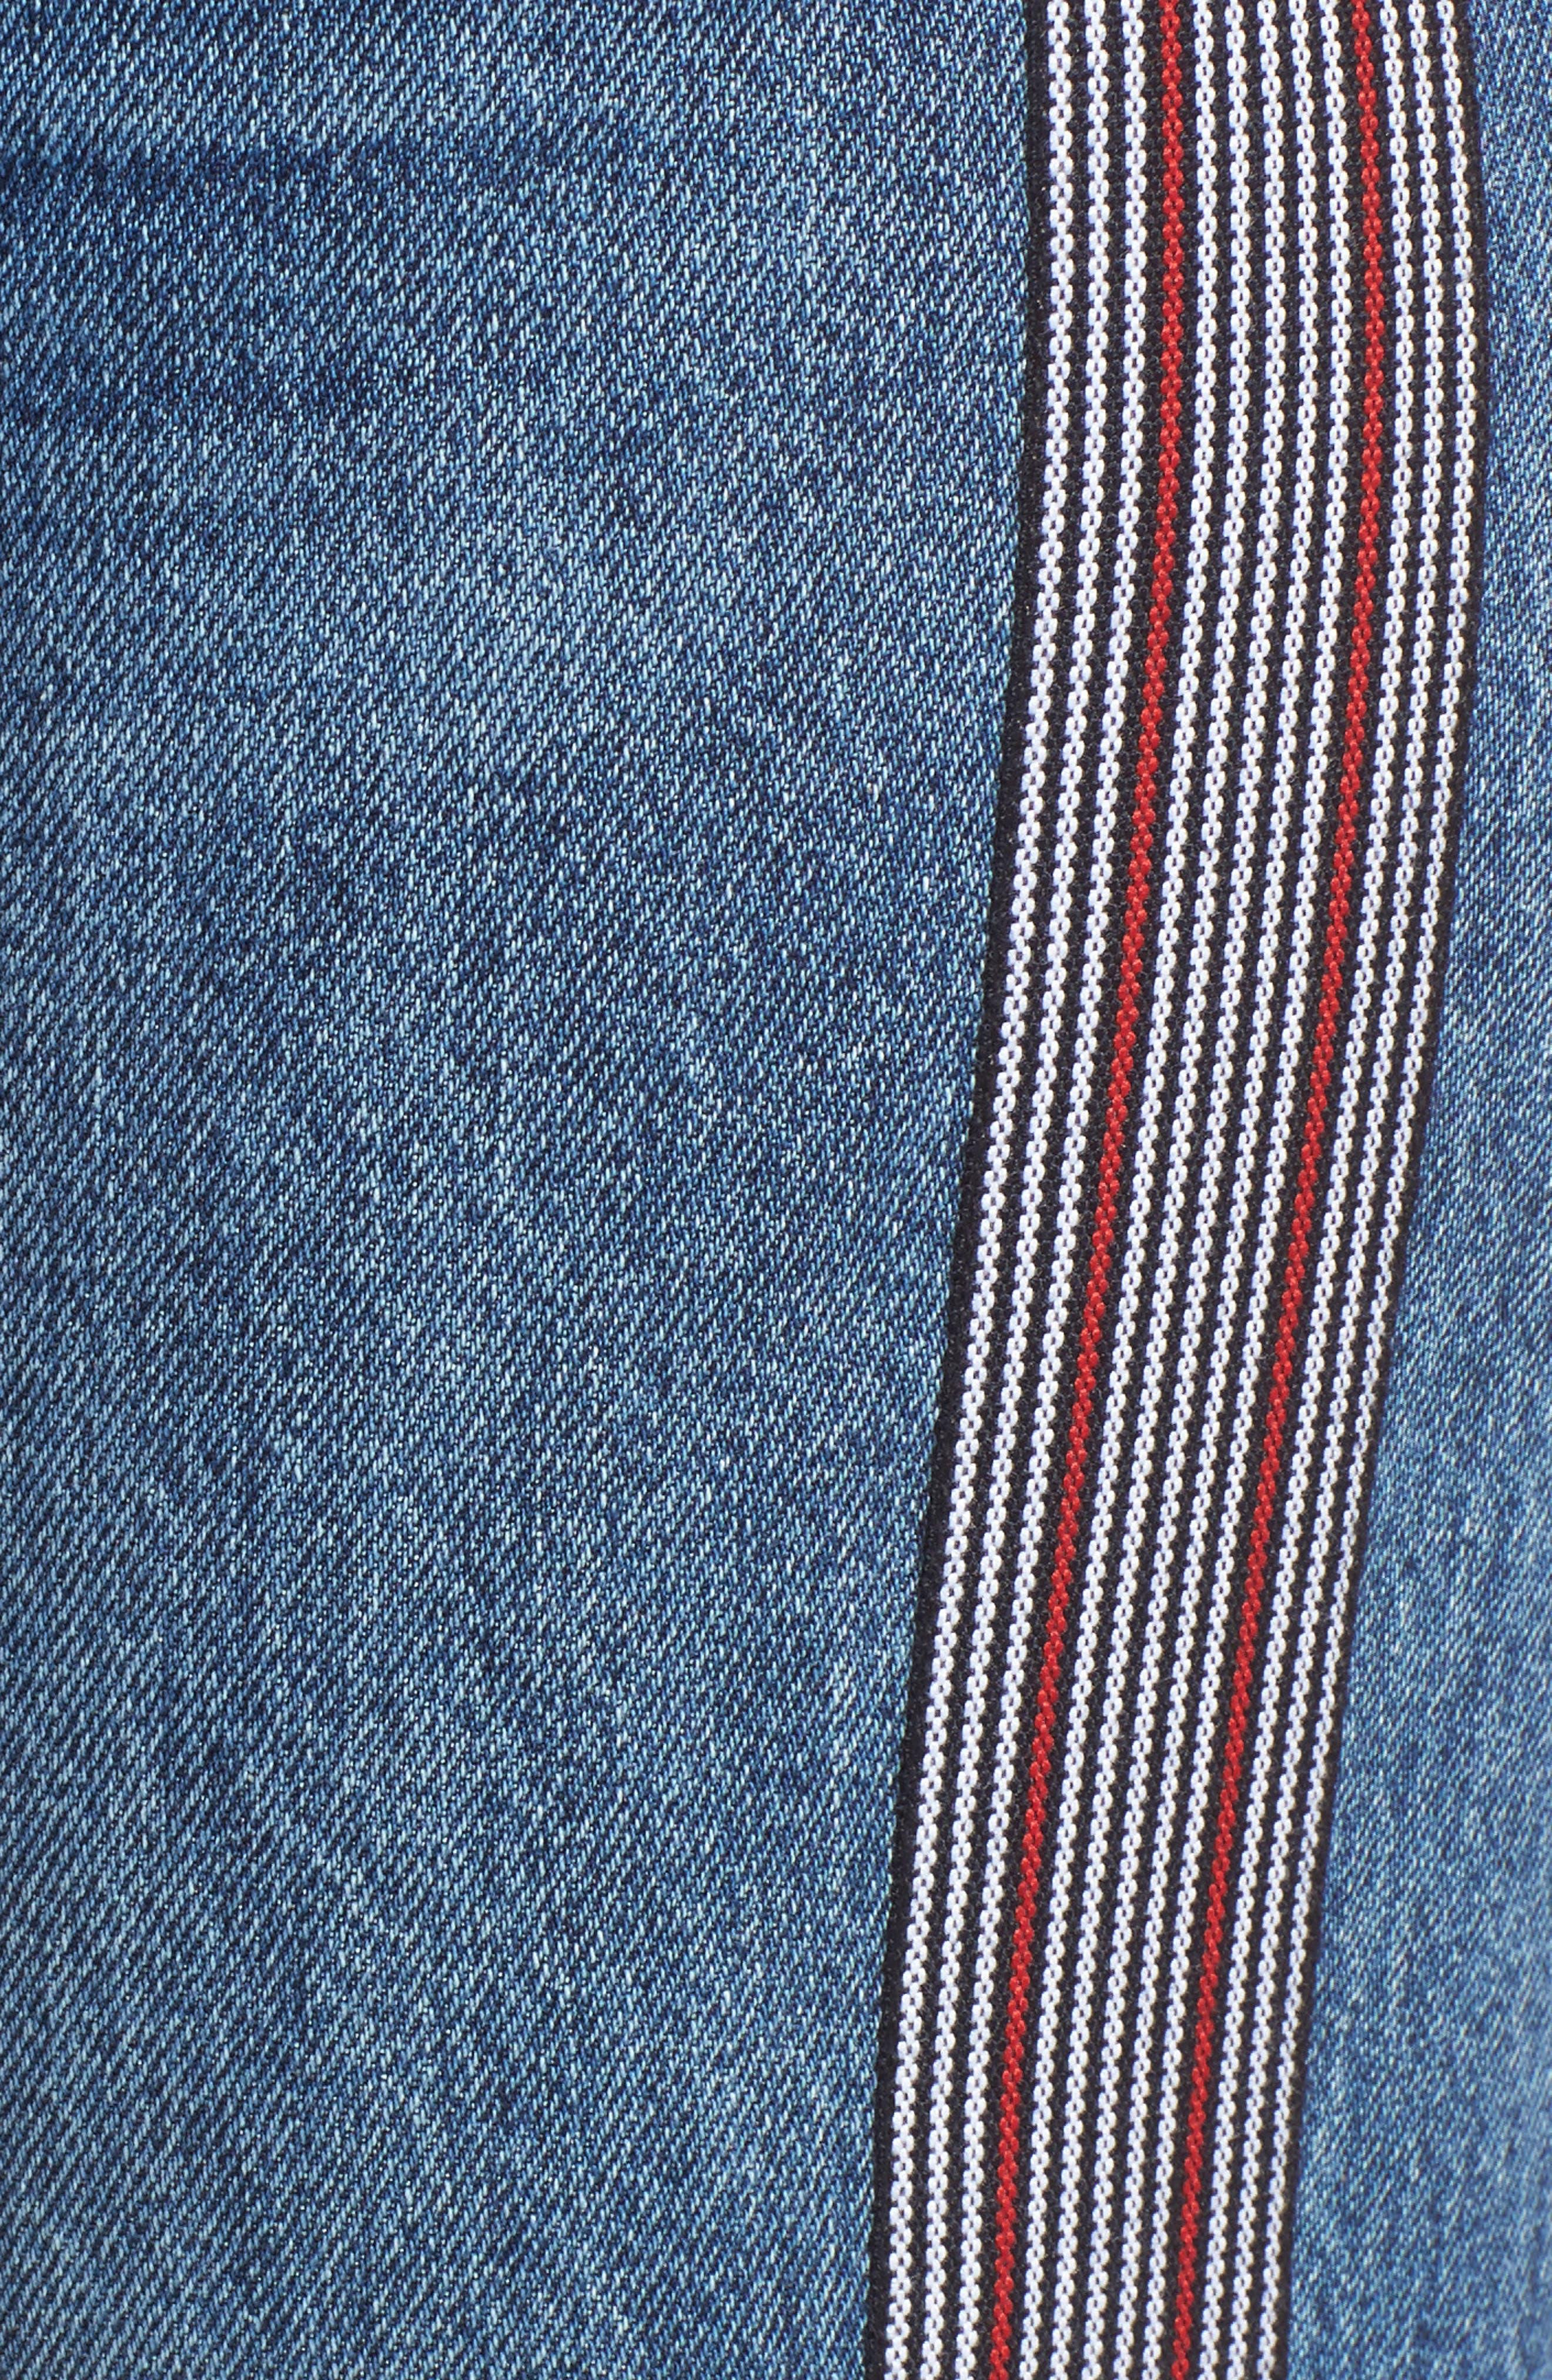 Riley Crop Straight Leg Jeans,                             Alternate thumbnail 6, color,                             Forgiver